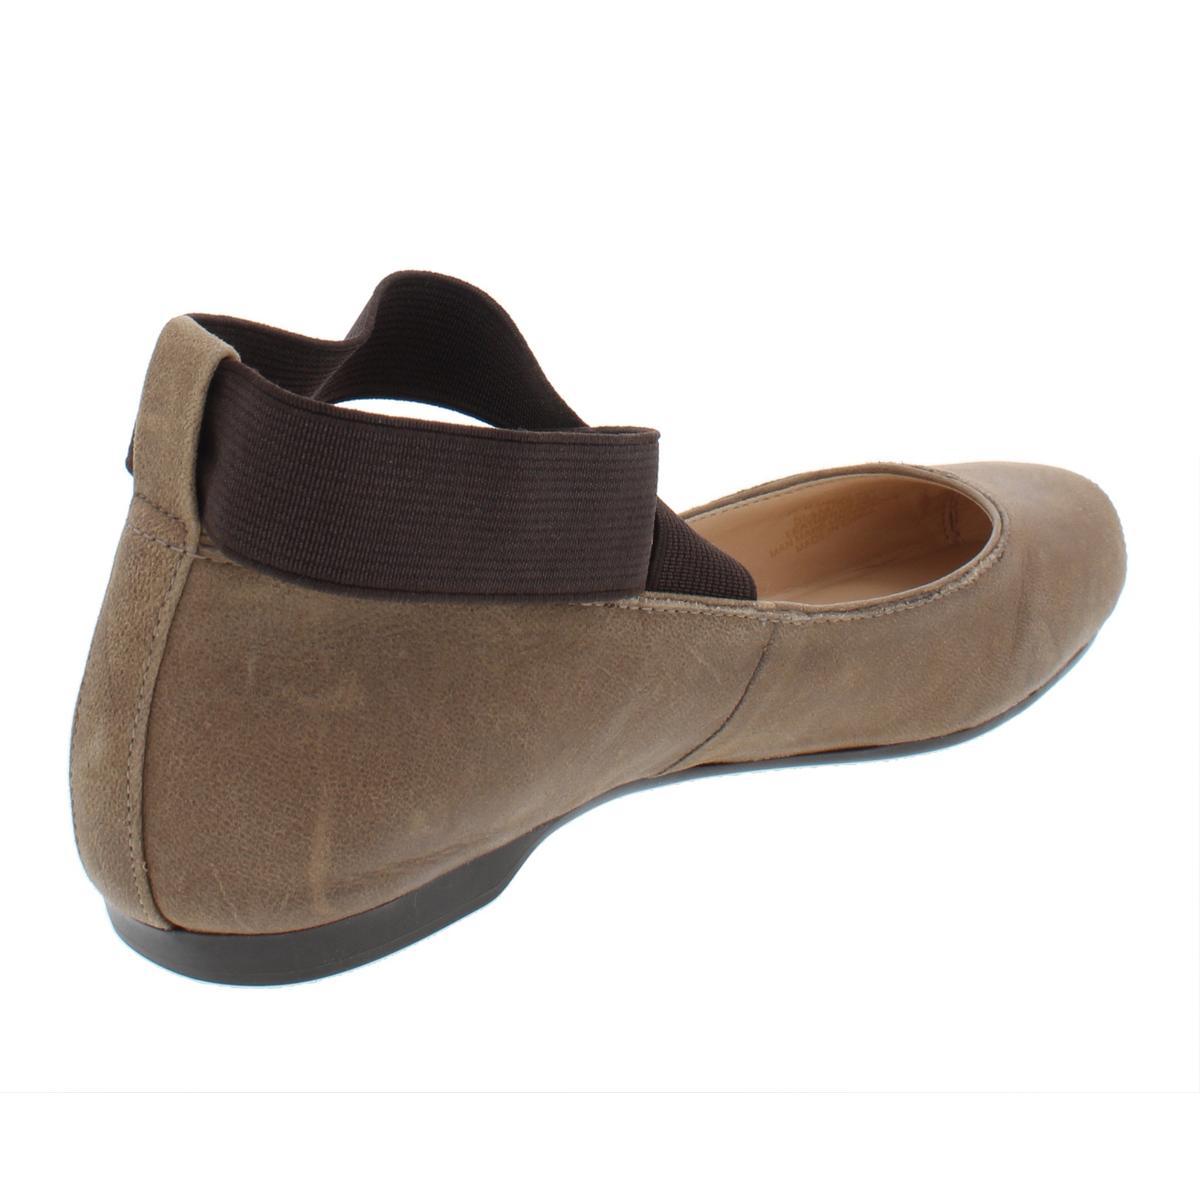 Jessica-Simpson-Women-039-s-Mandalaye-Square-Toe-Ankle-Wrap-Ballet-Flats thumbnail 3